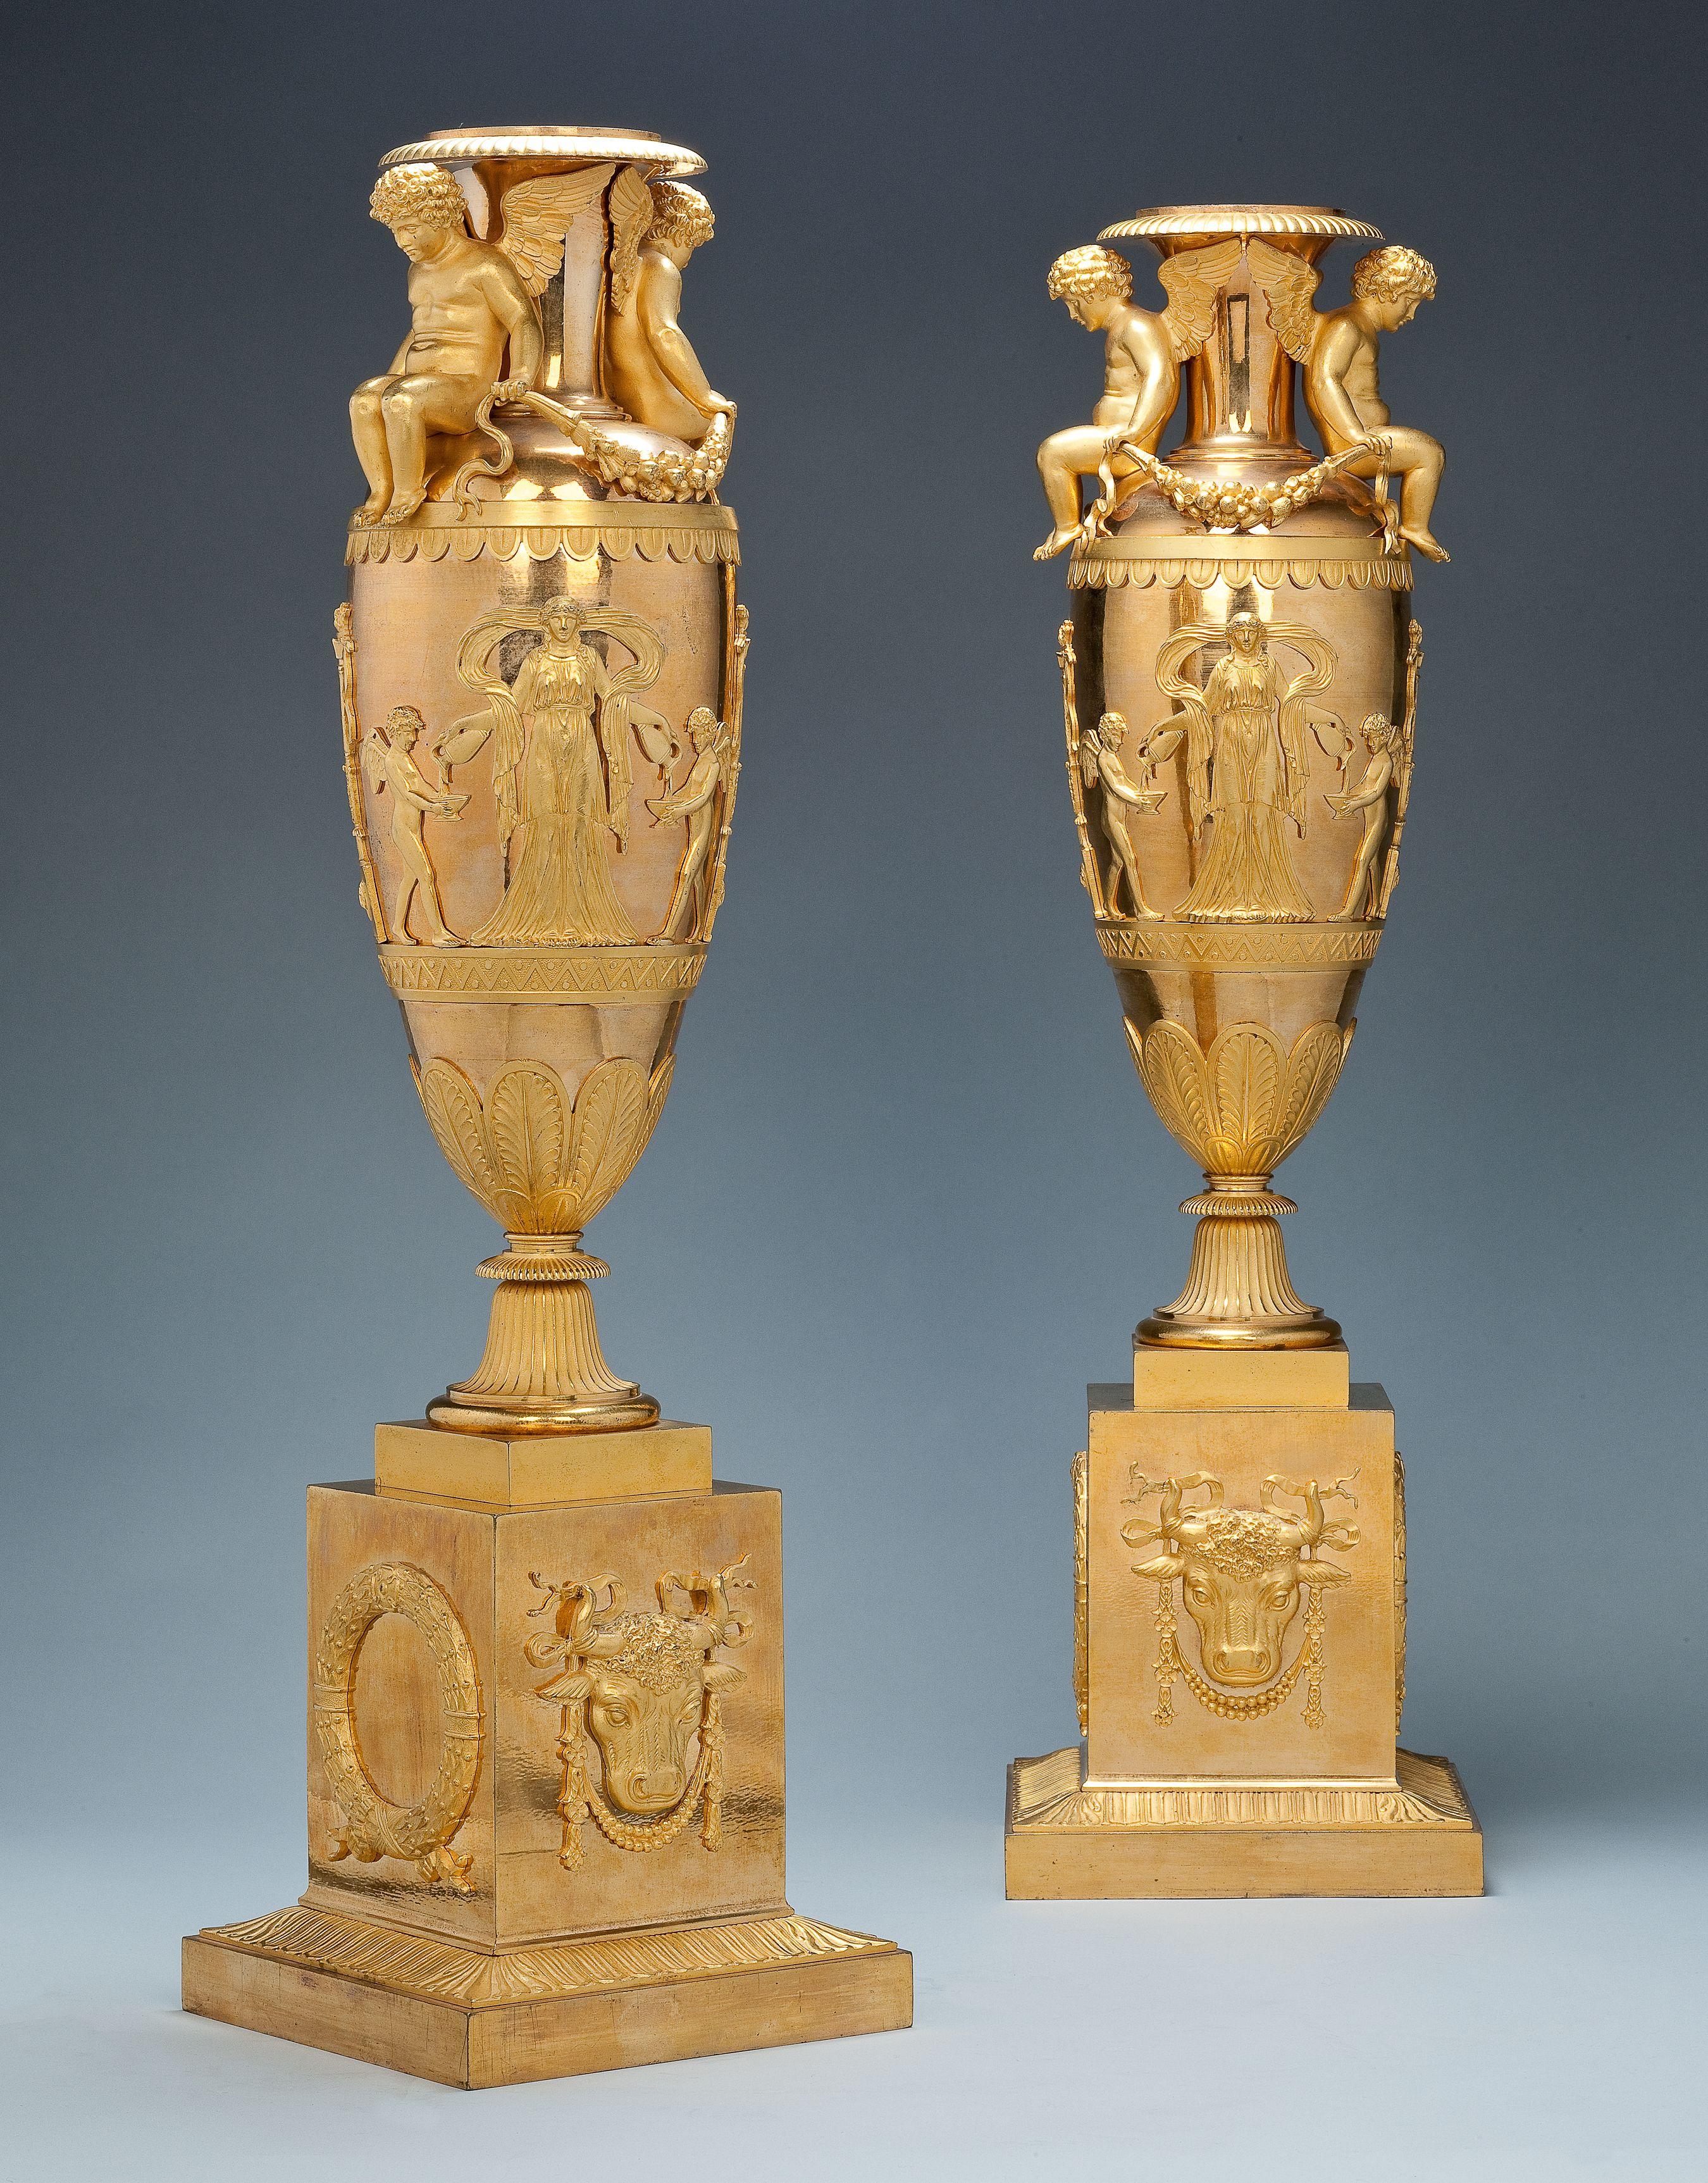 A pair of gilt bronze empire vases urnsvasesflowerpots a pair of gilt bronze empire vases reviewsmspy